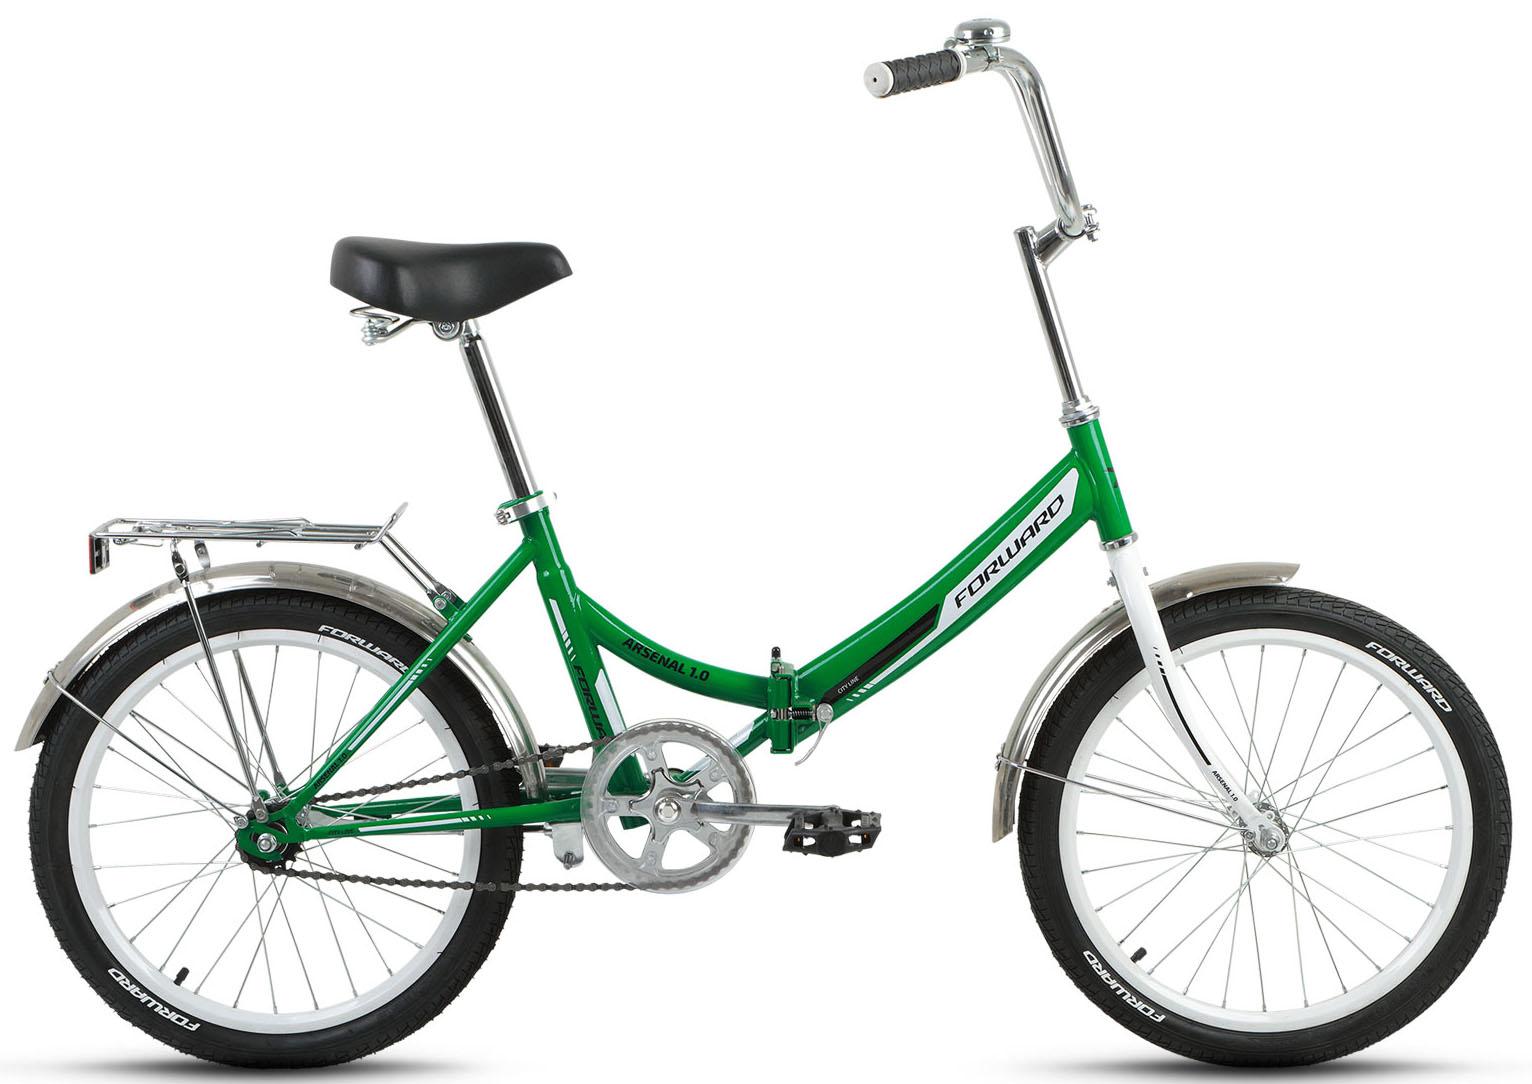 Велосипед Forward Arsenal 20 1.0 2019 велосипед forward arsenal 2 0 красный ростовка 14